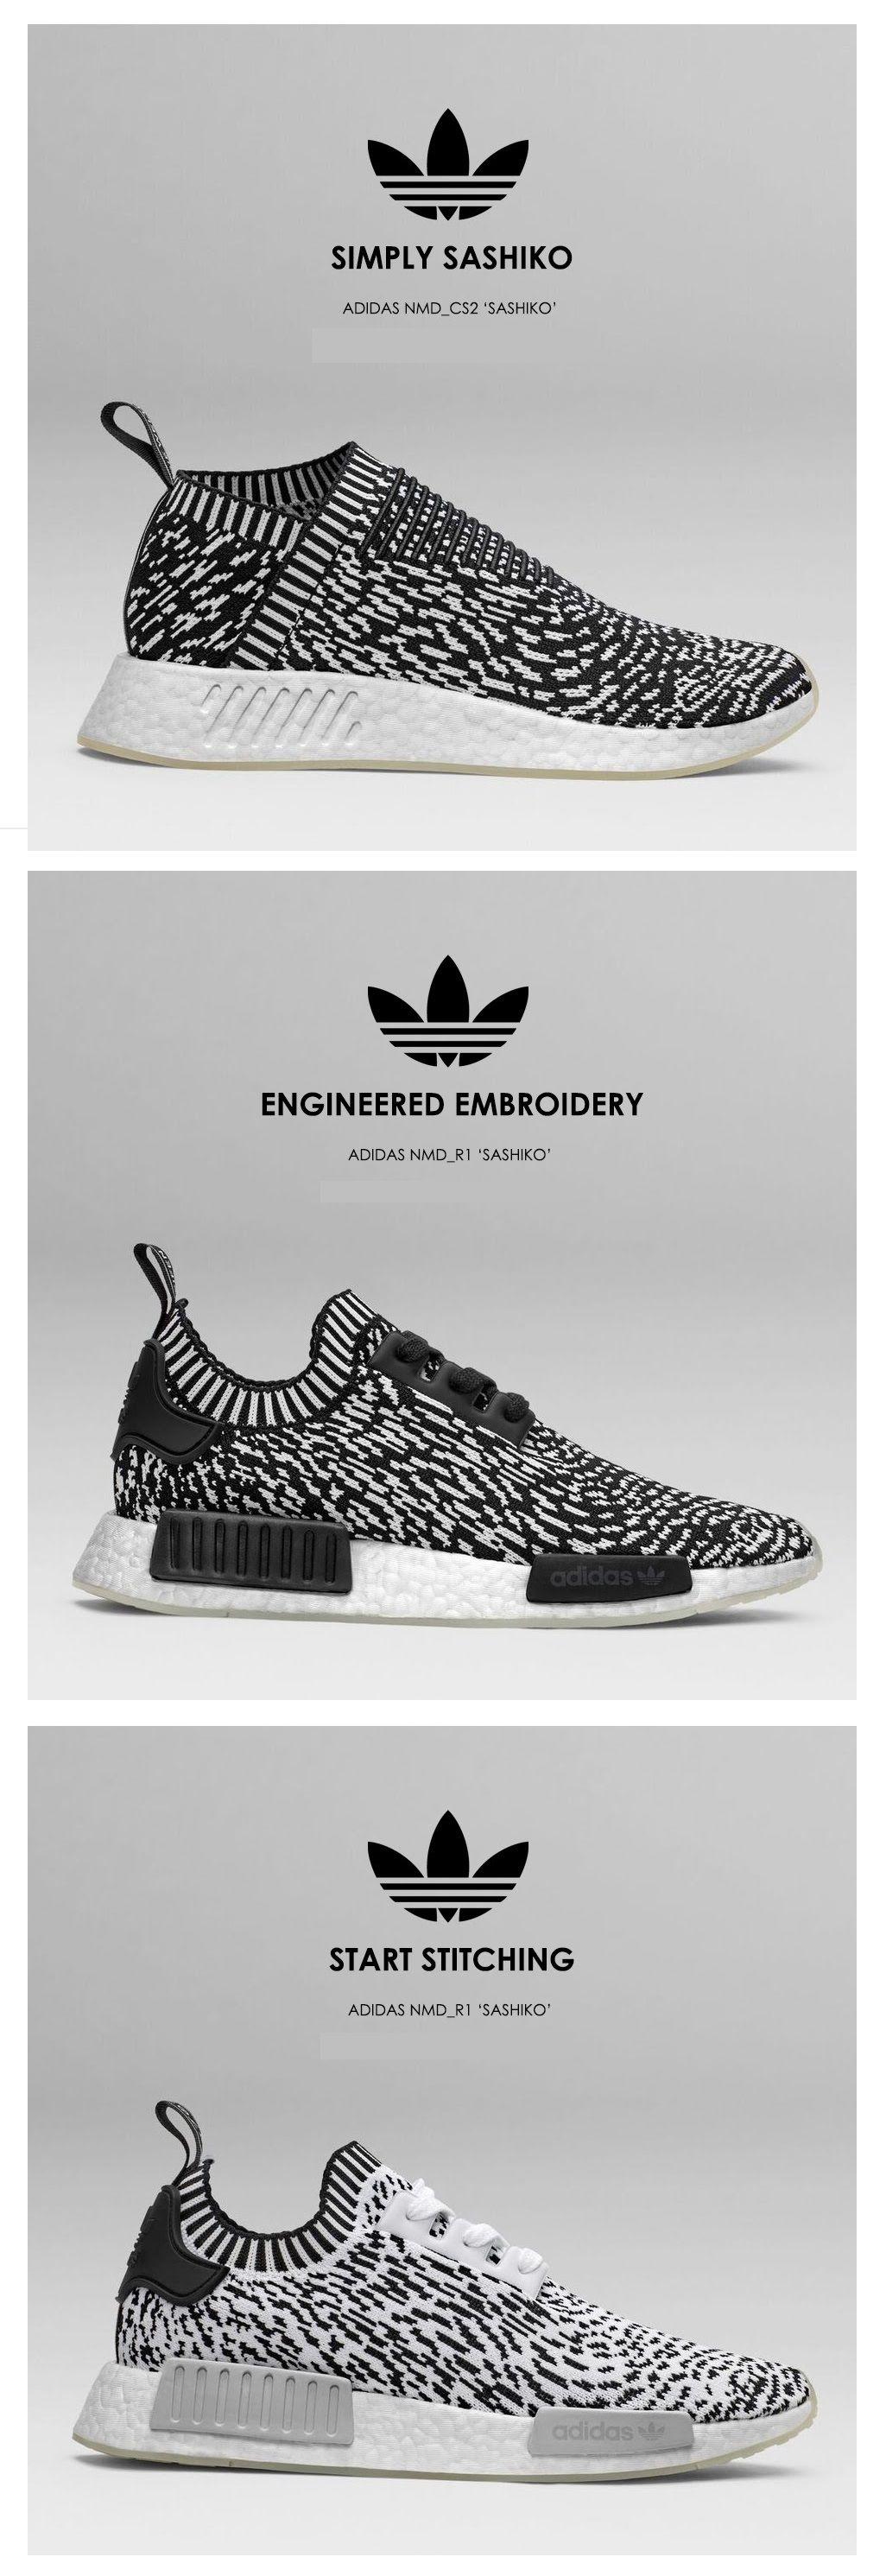 ADIDAS NMD City Sock #fashion #snap | Style | Pinterest | Adidas nmd, Nmd  and Adidas